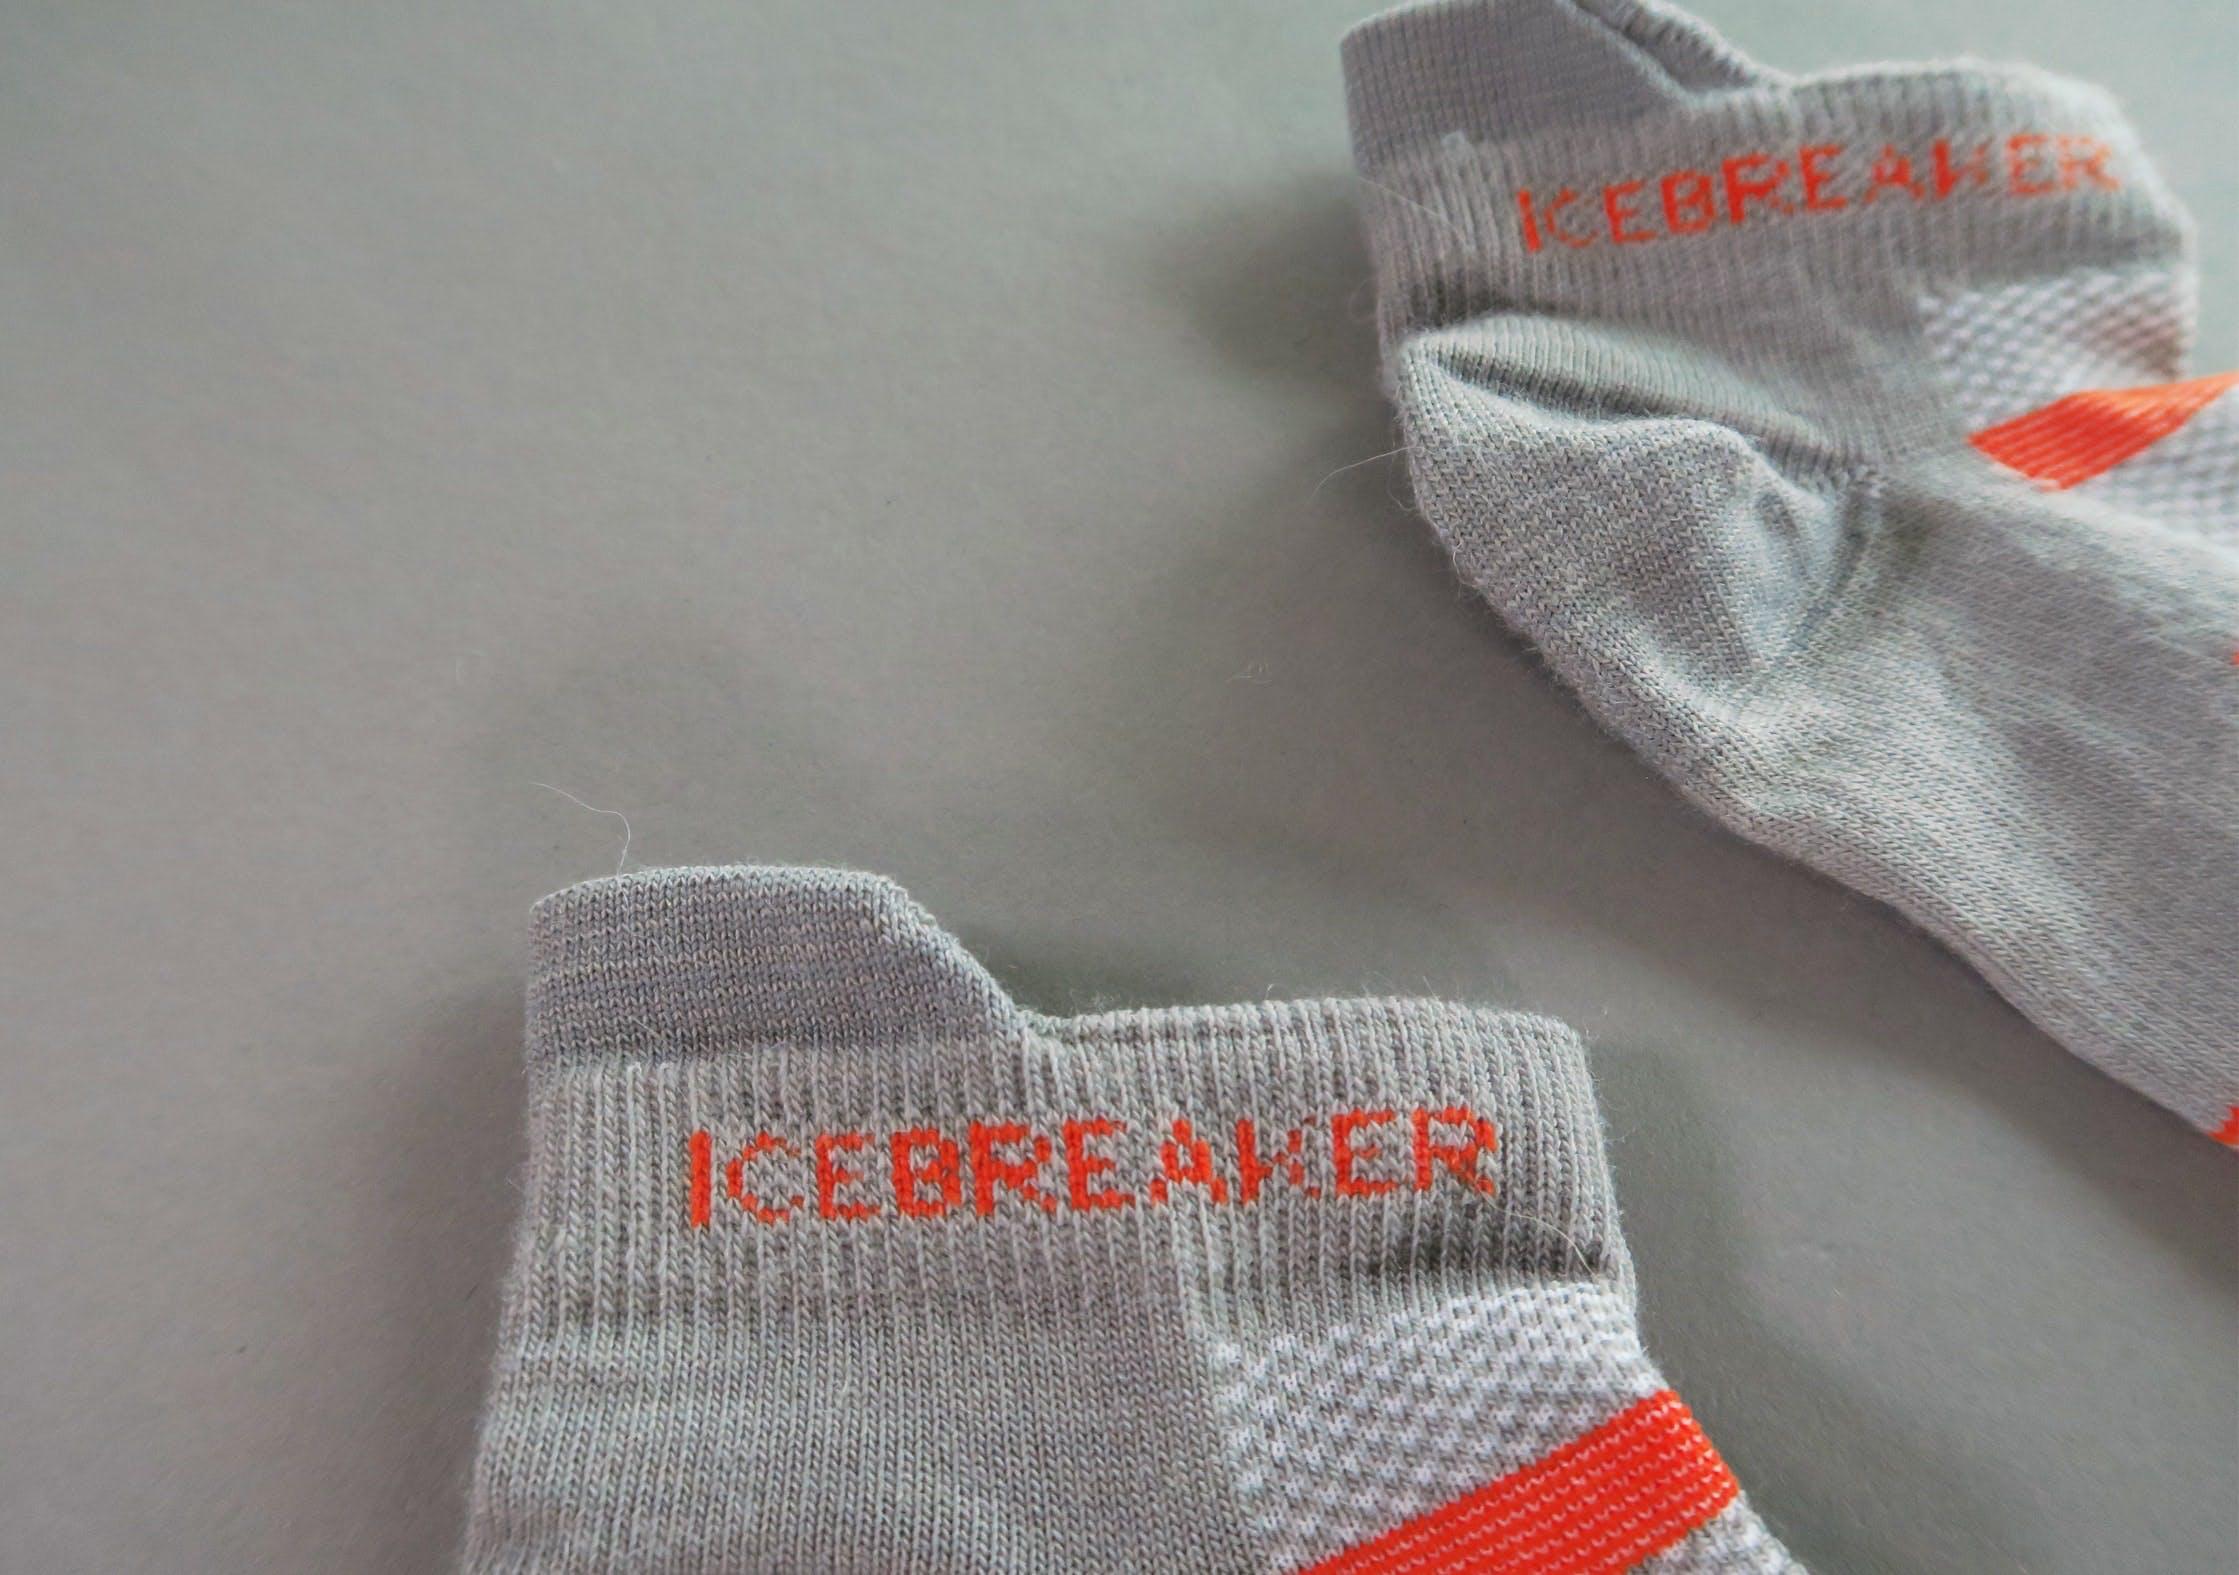 Icebreaker Multisport Ultralight Micro Socks